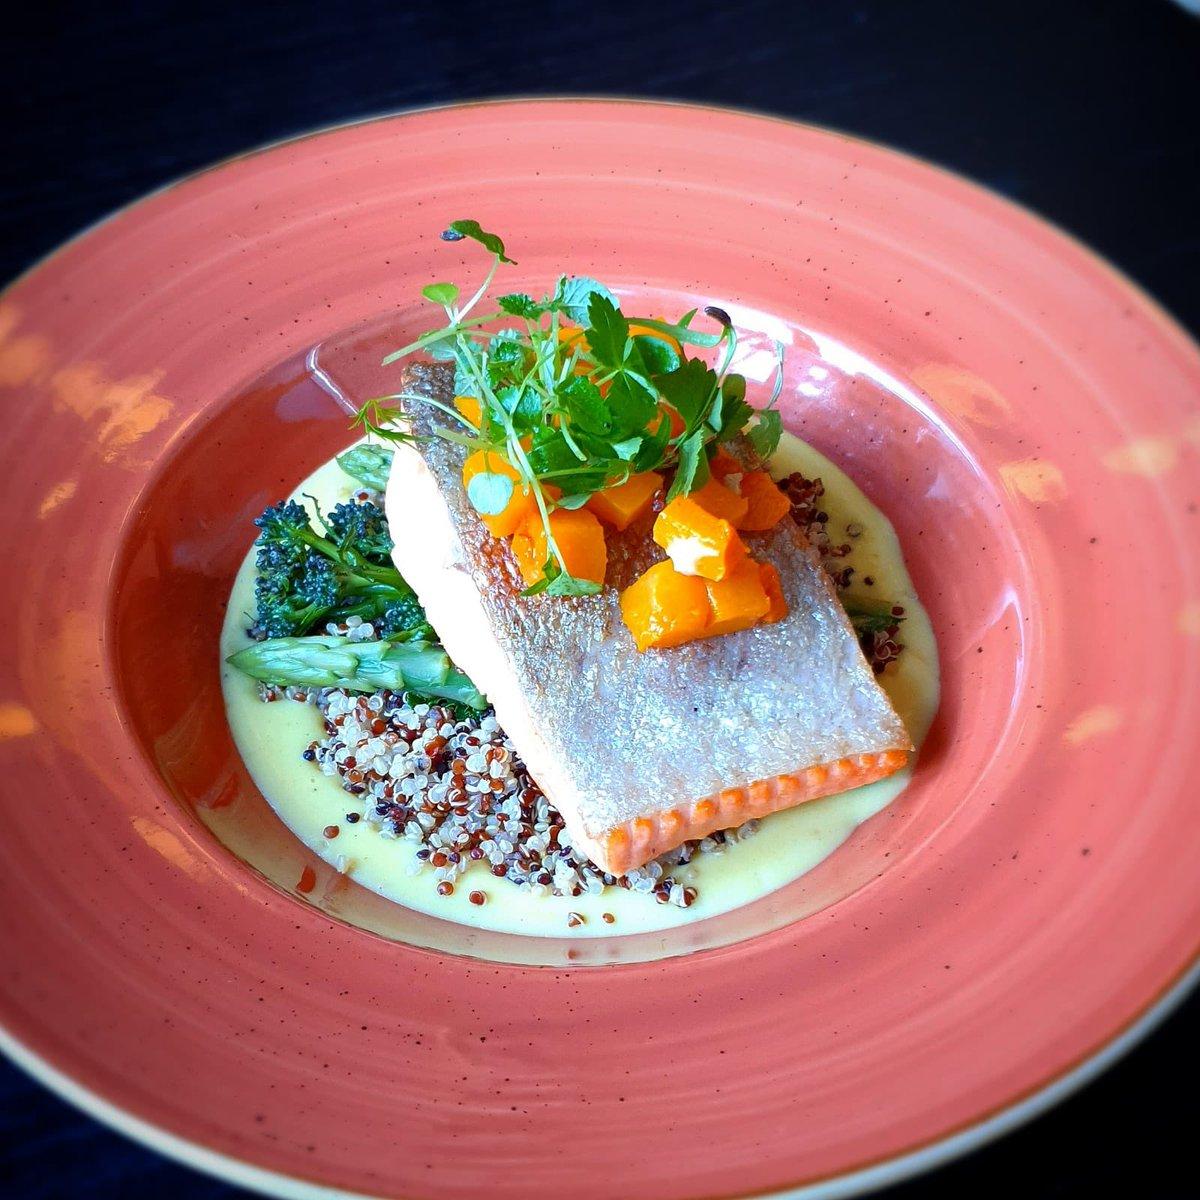 Today's special. Baked sea trout with lemon saffron cream,quinoa, asparagus and butternutsquash 👨🍳 👩🍳 #dublincitycentre #dublinonourdoorstep #Ourteam #chefgoals #chefteam #dublinfood #dublindining https://t.co/5GxY7AV8vr